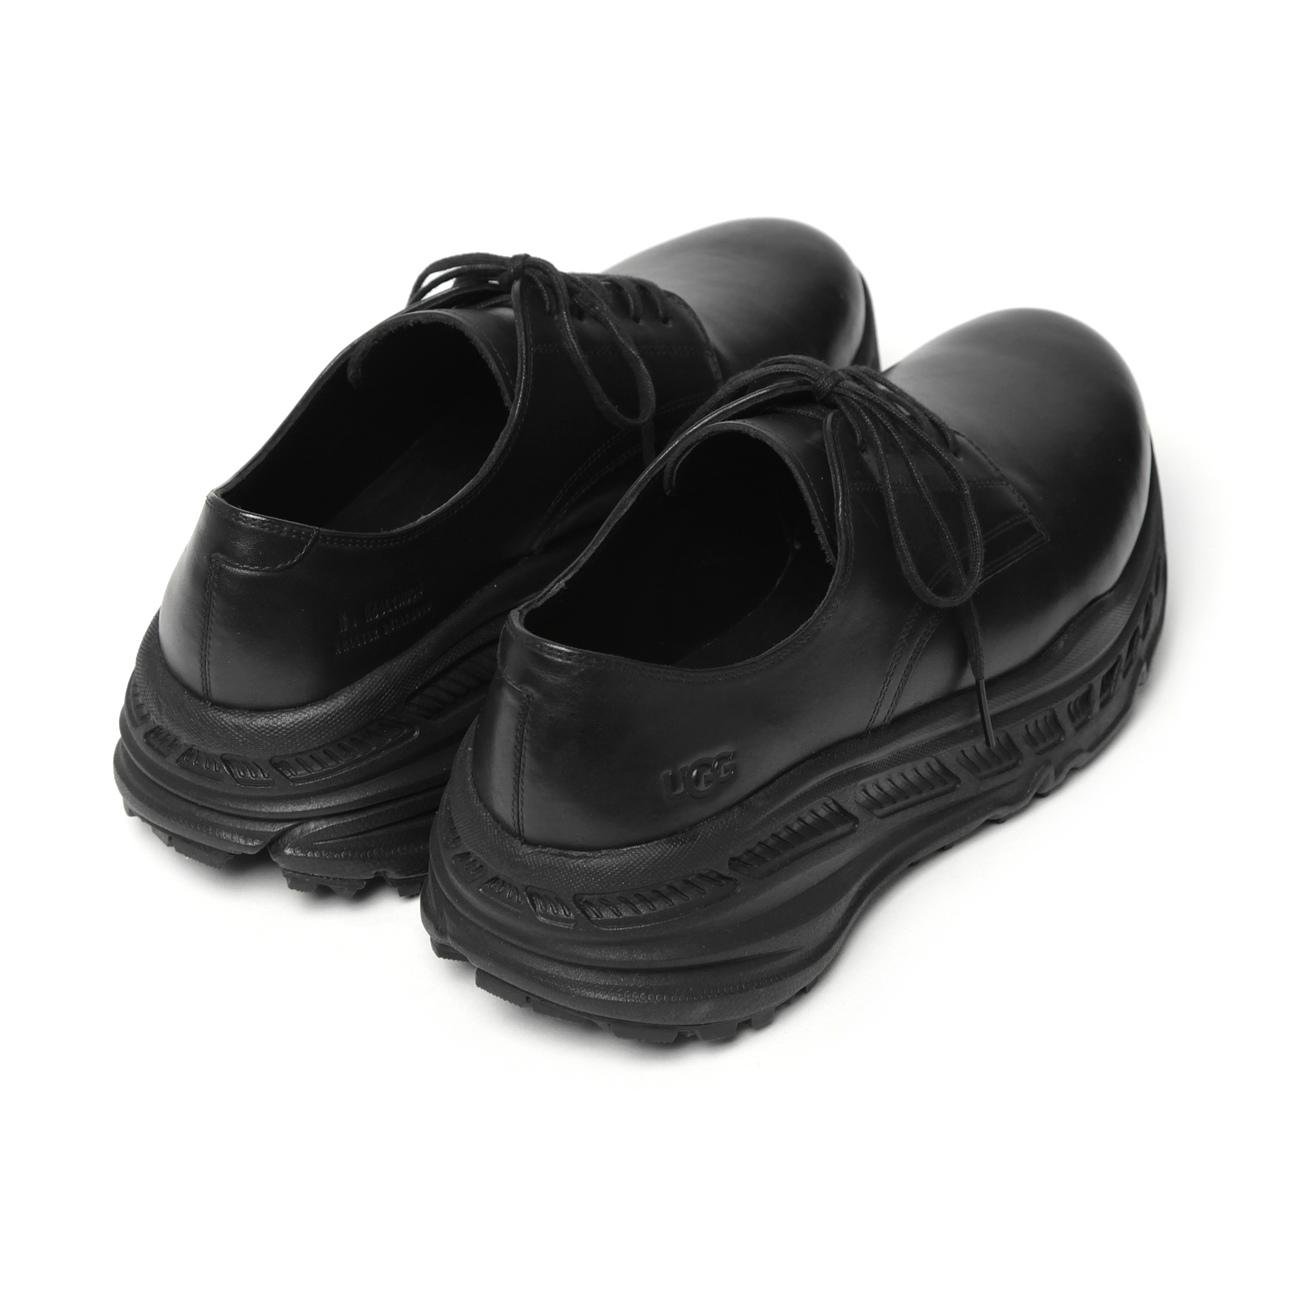 N.HOOLYWOOD / エヌハリウッド 通販 2201-SE01-peg N.HOOLYWOOD COMPILE × UGG ドレスシューズ - Black